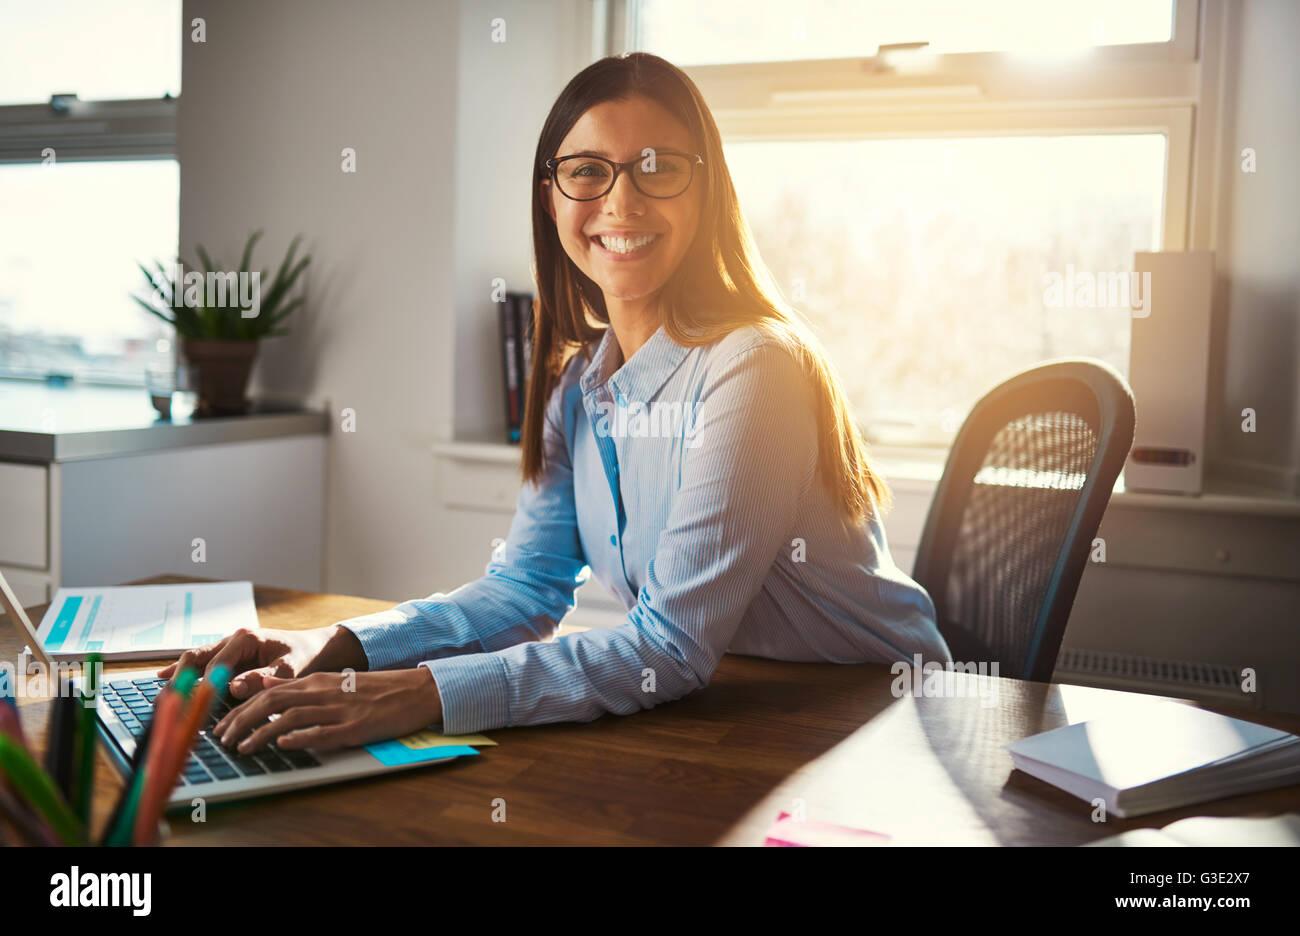 Female entrepreneur at desk smiling at camera, blue warm colors - Stock Image